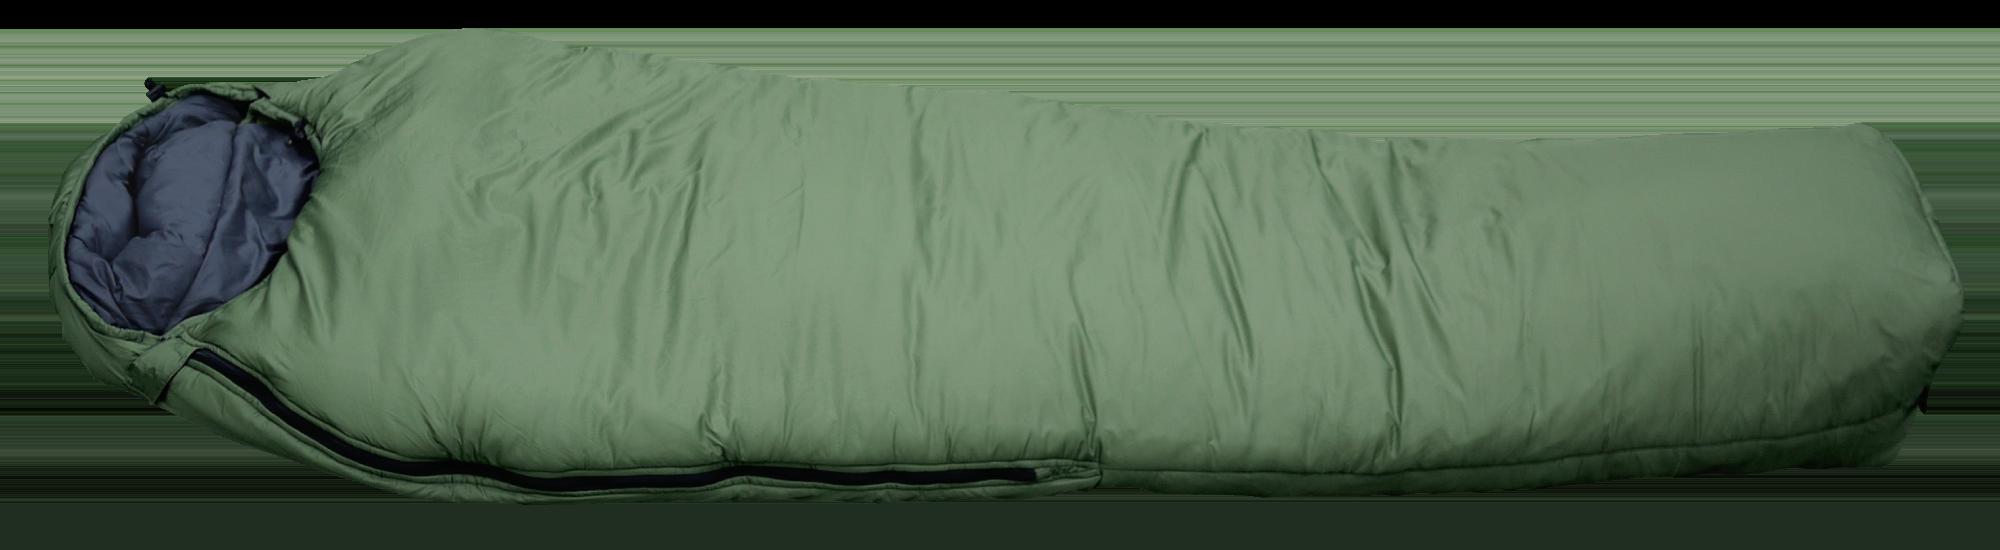 Simply Green 25 Sleeping Bag